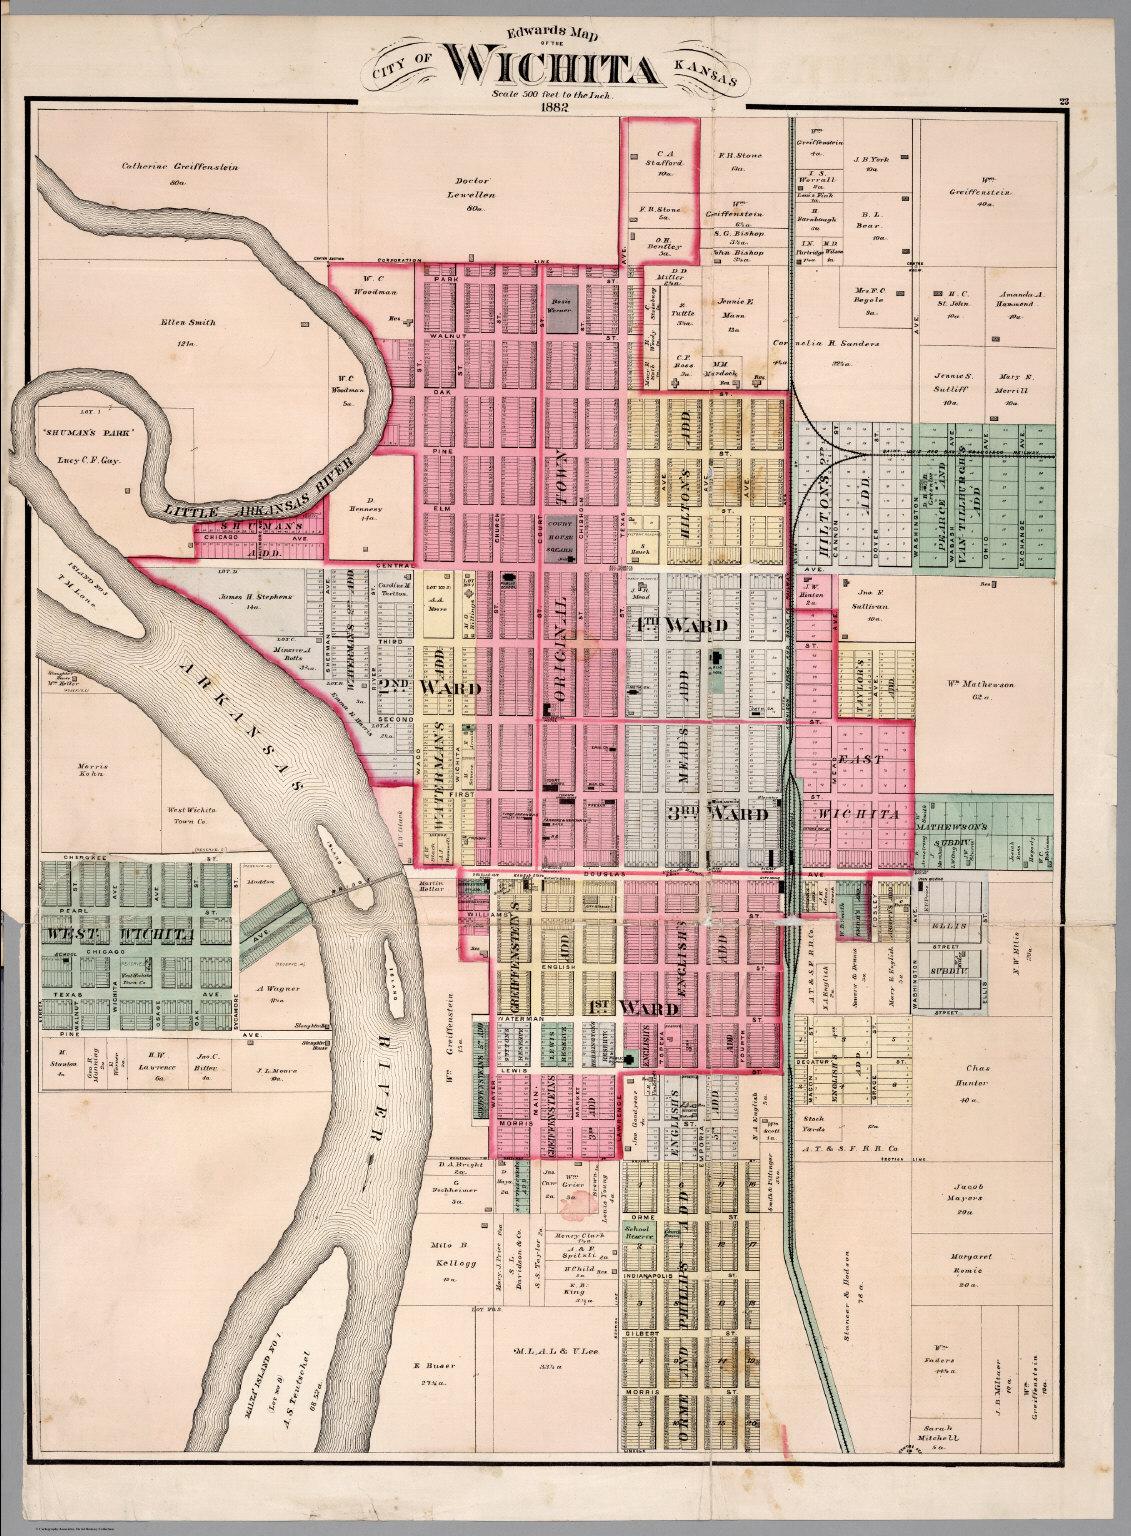 Edwards Map of the City of Wichita Kansas 1882 David Rumsey